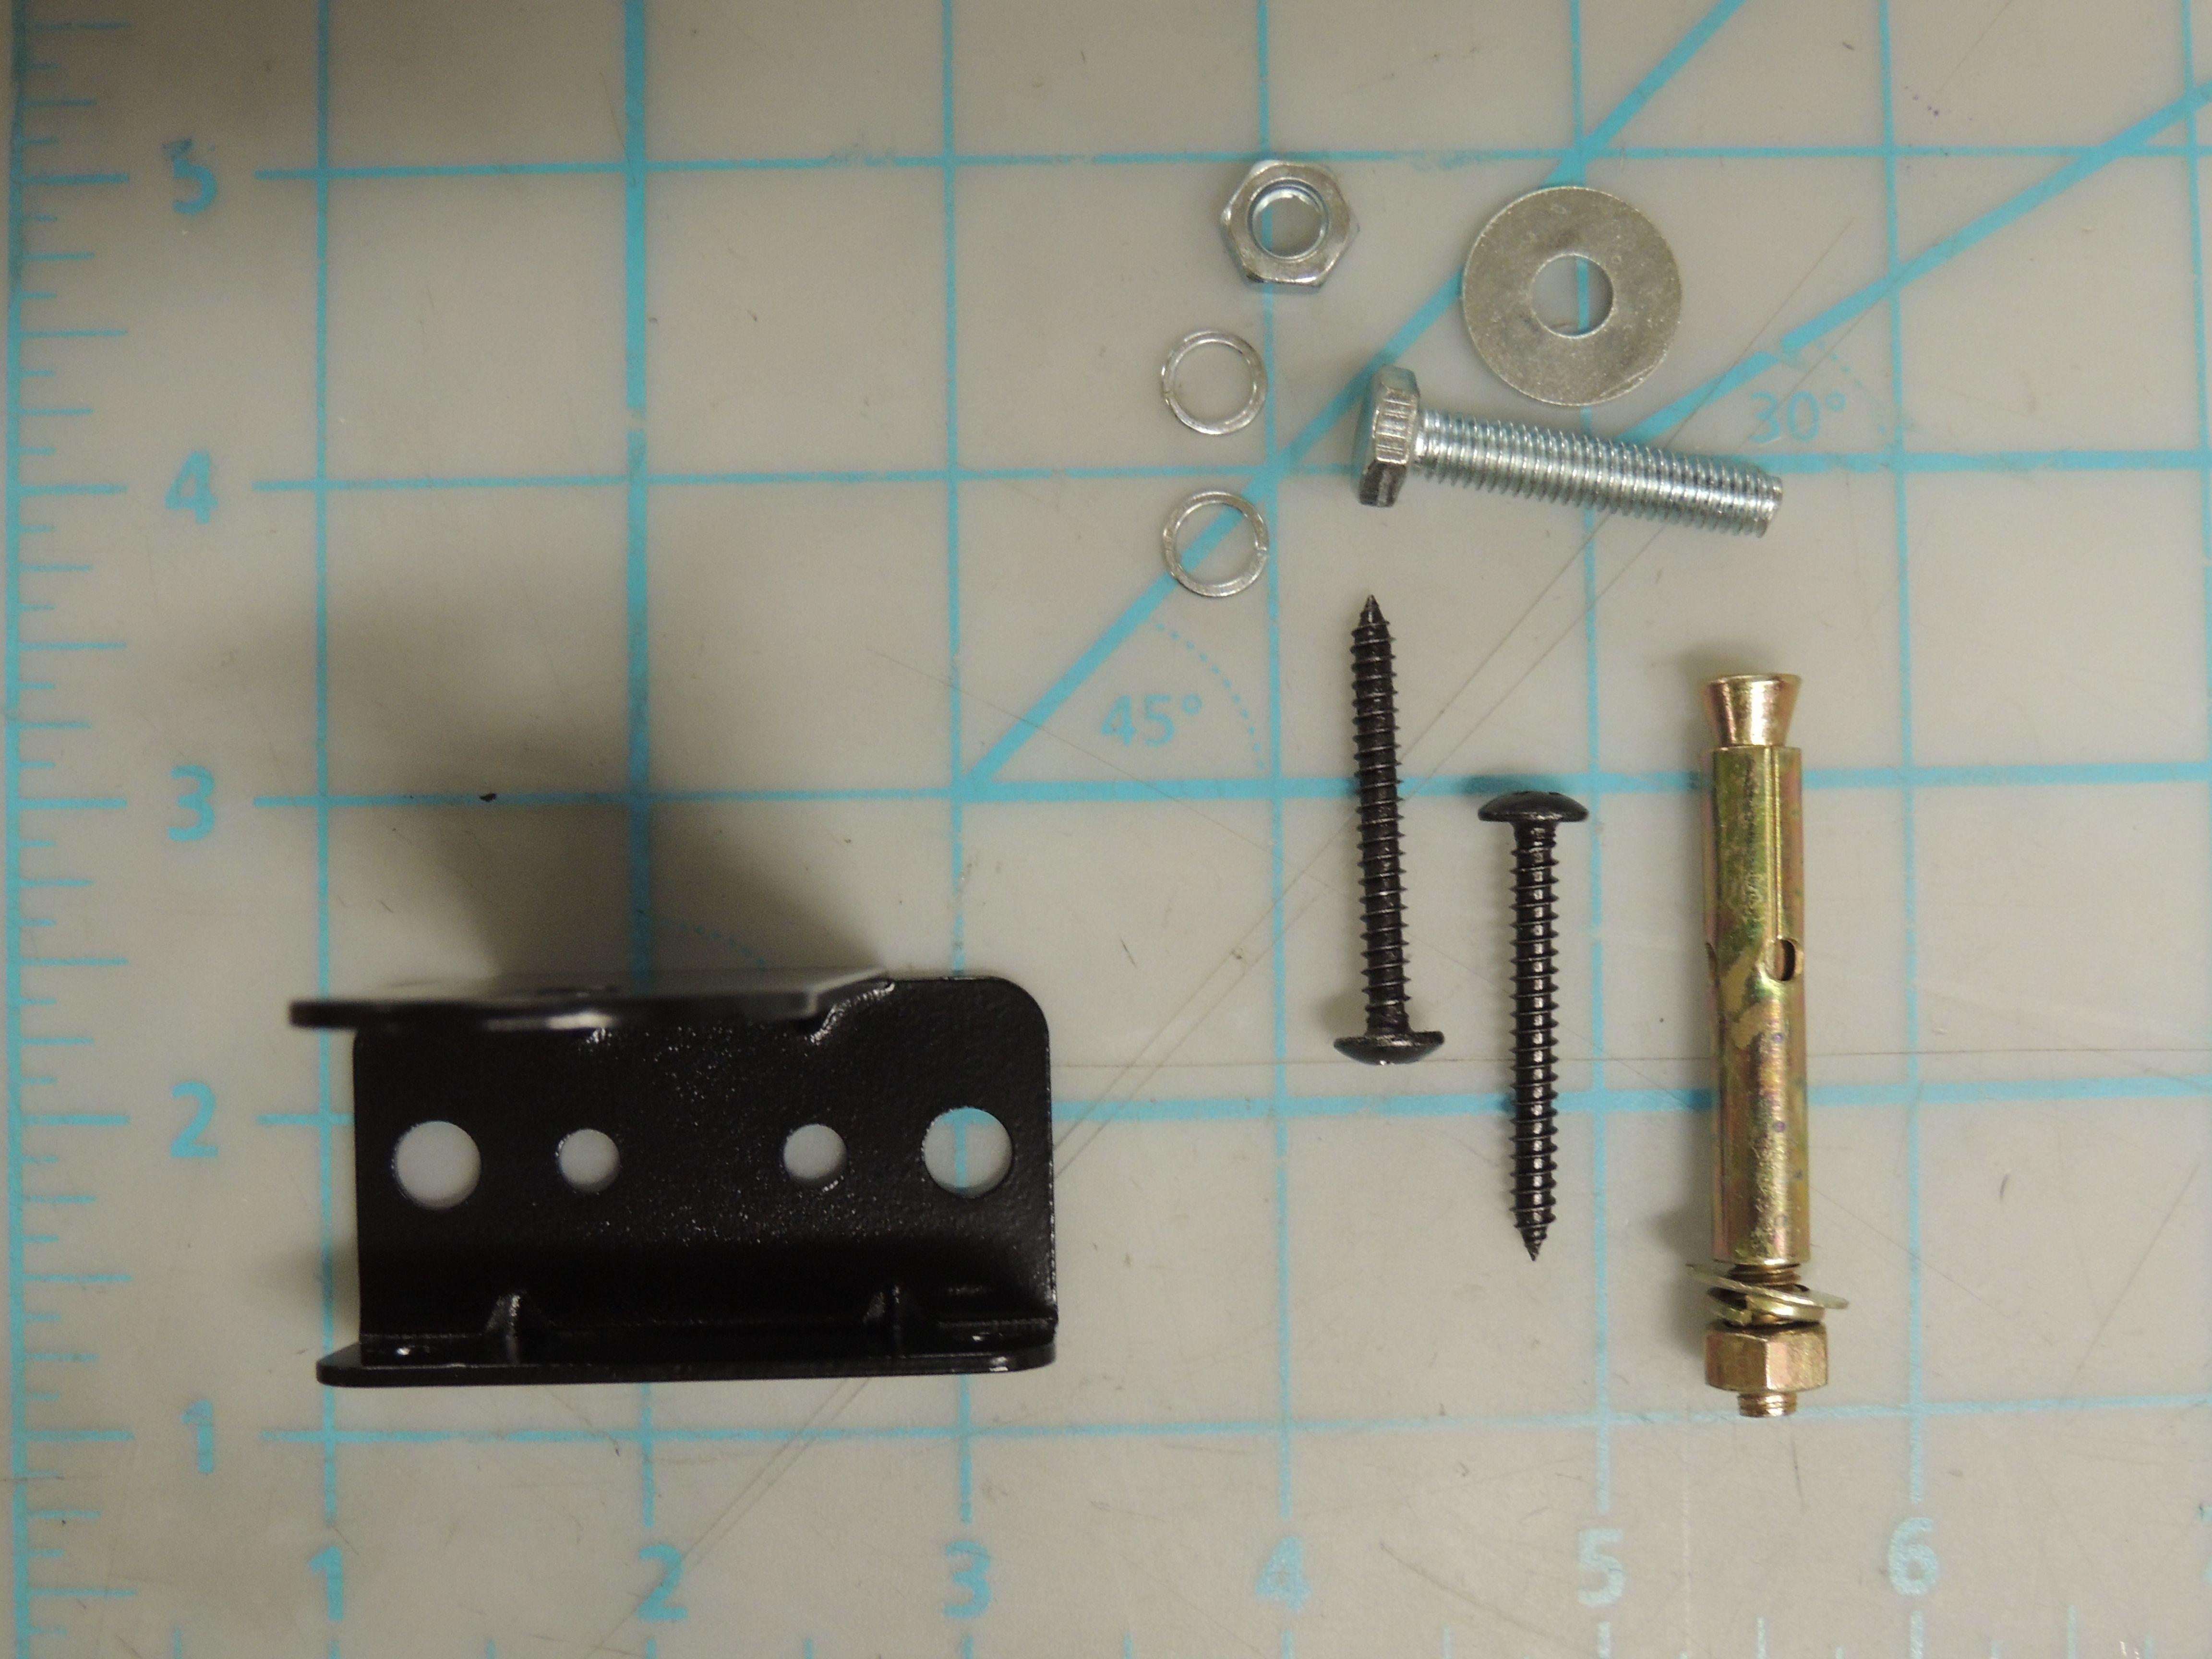 Anti-tip bracket with screws